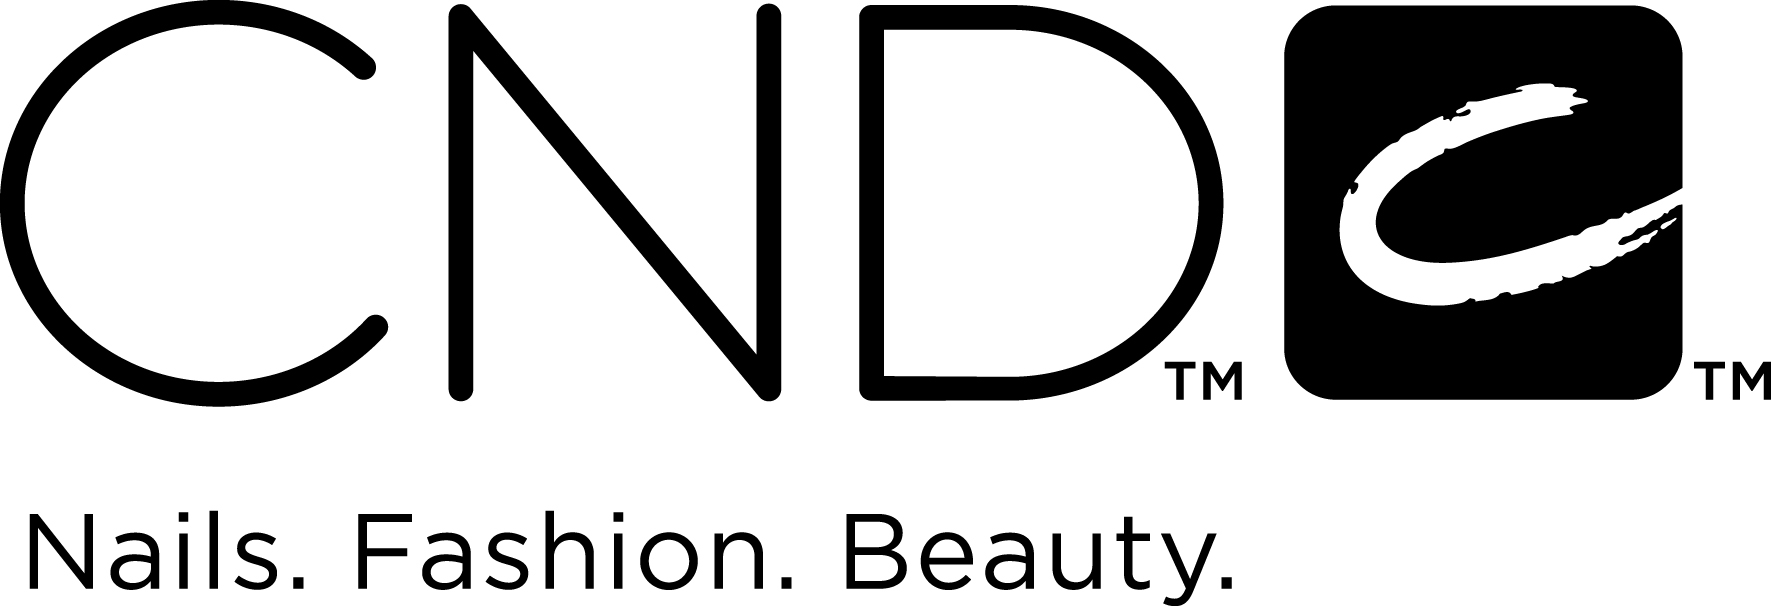 8734059 CND Logo Intl Blk 15cm